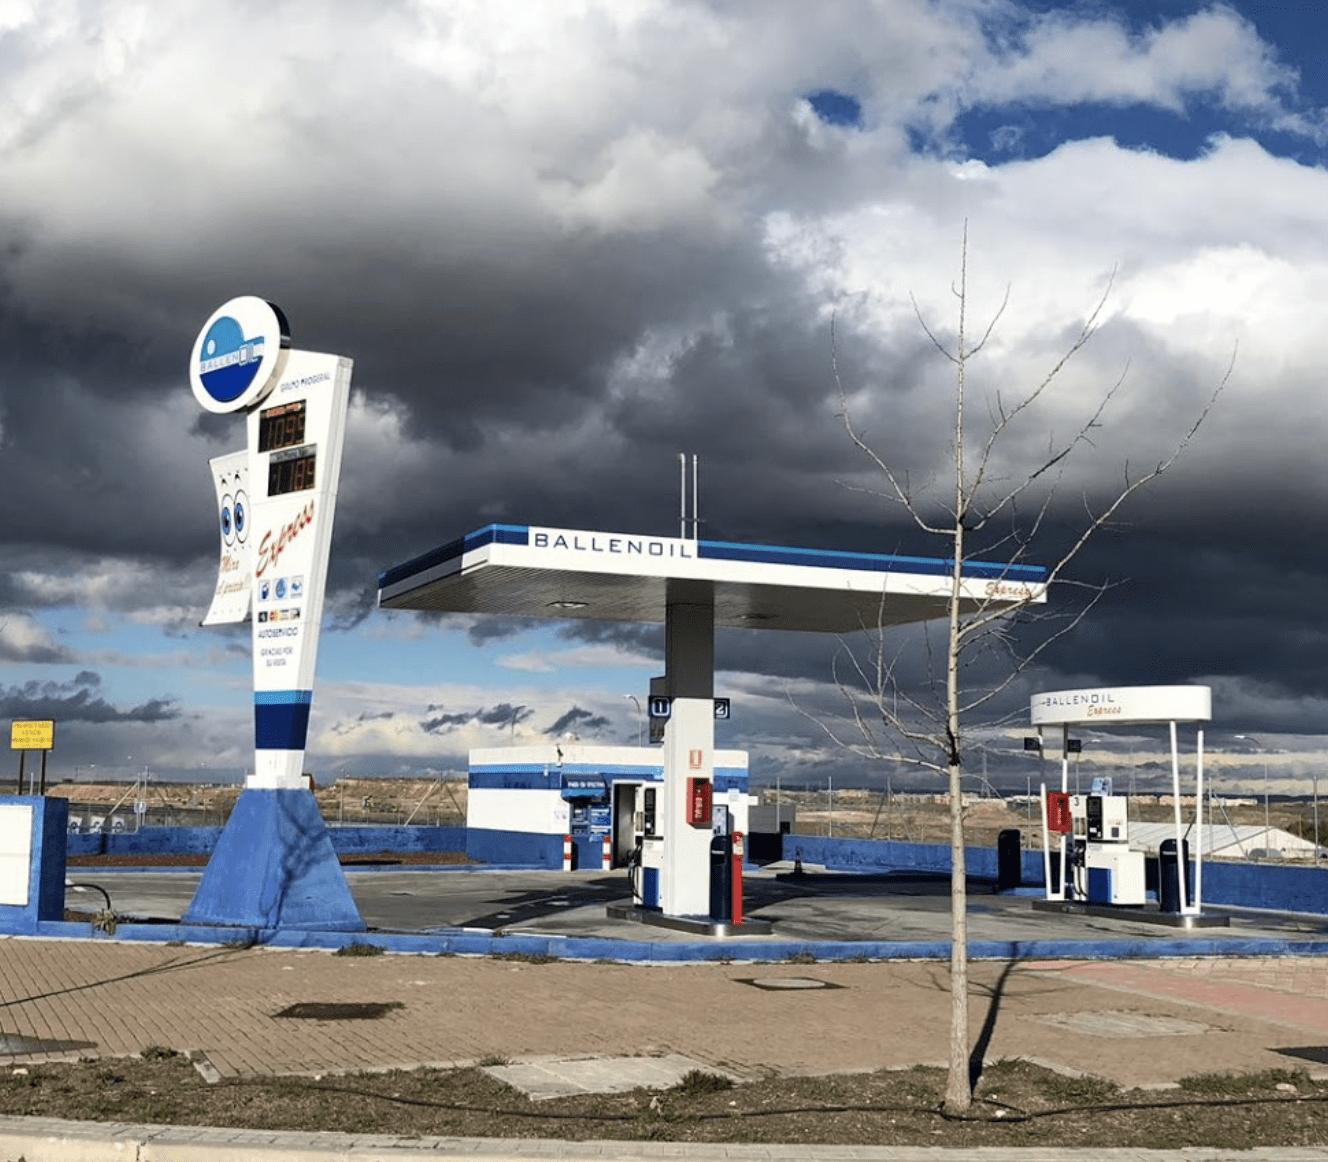 Gasolinera Ballenoil Vallecas